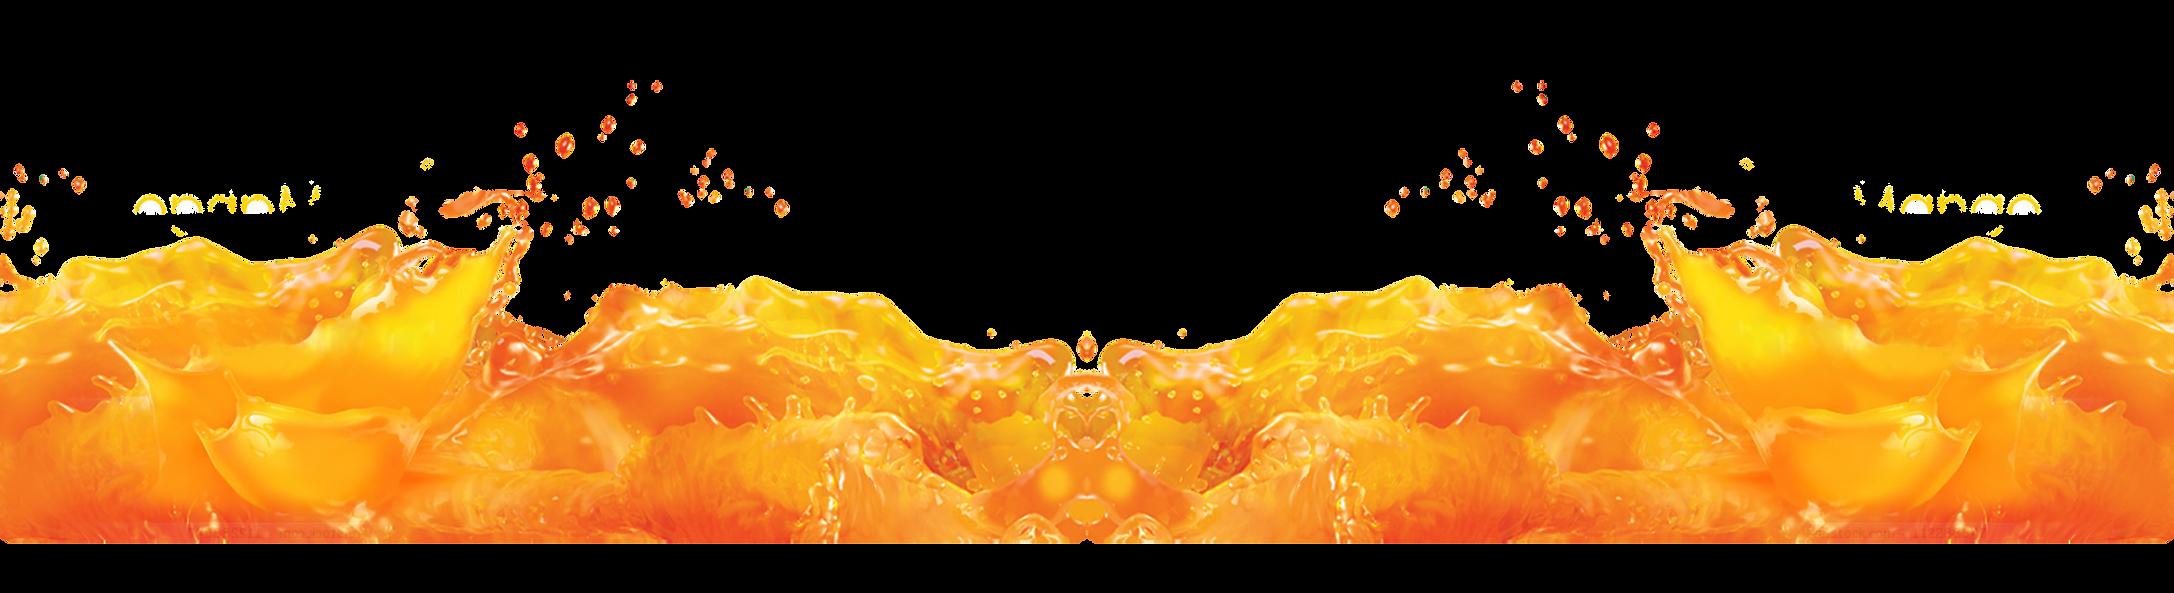 22x6 gkradio poster orange juice.png